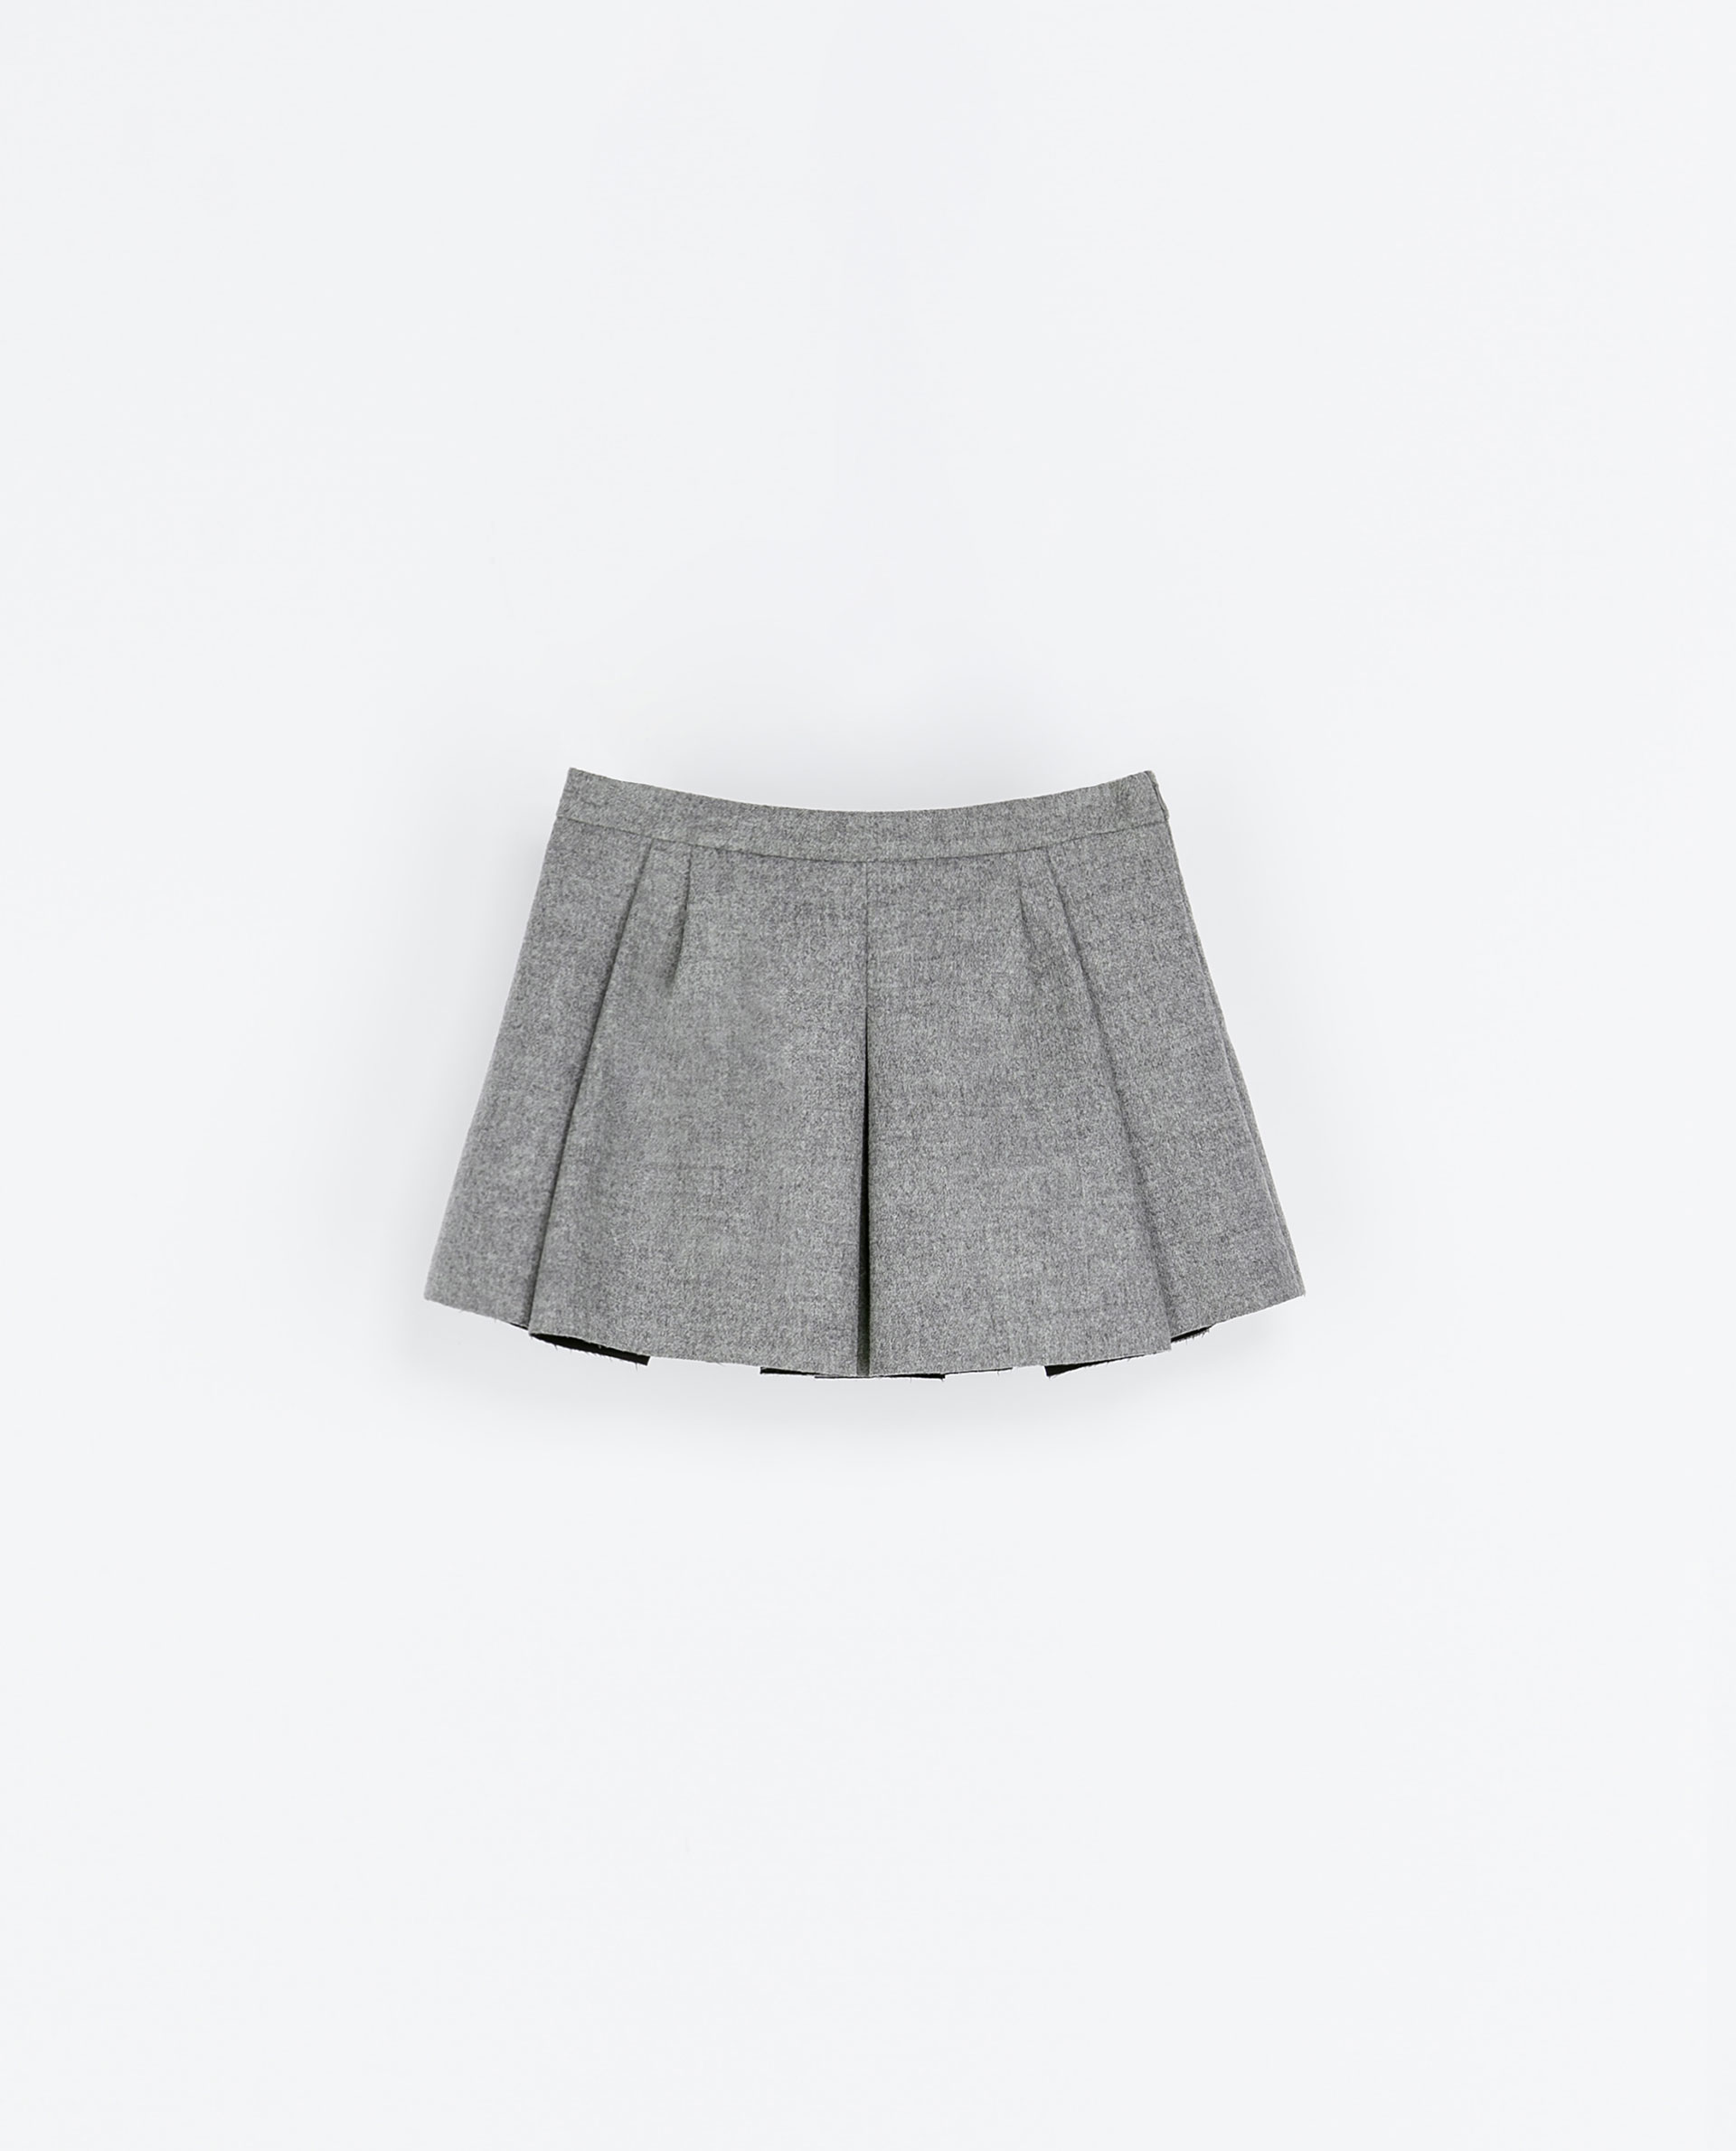 Zara Studio Box Pleat Skirt in Gray | Lyst